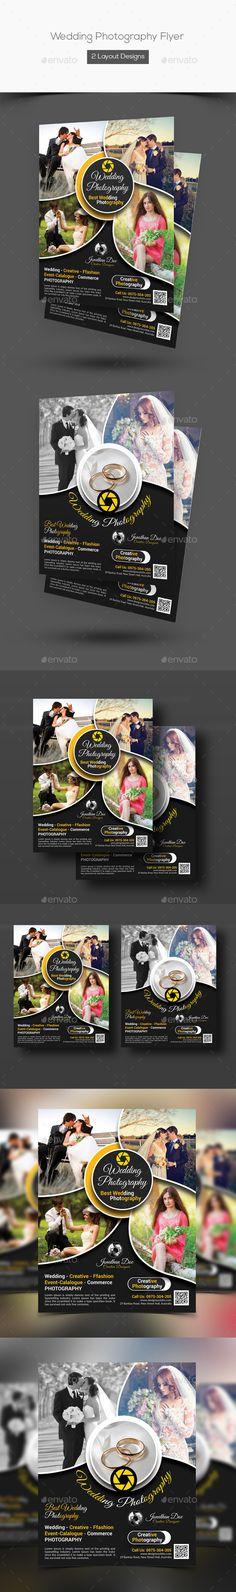 Wedding Photography Flyer Photography flyer, Flyer printing and - wedding flyer